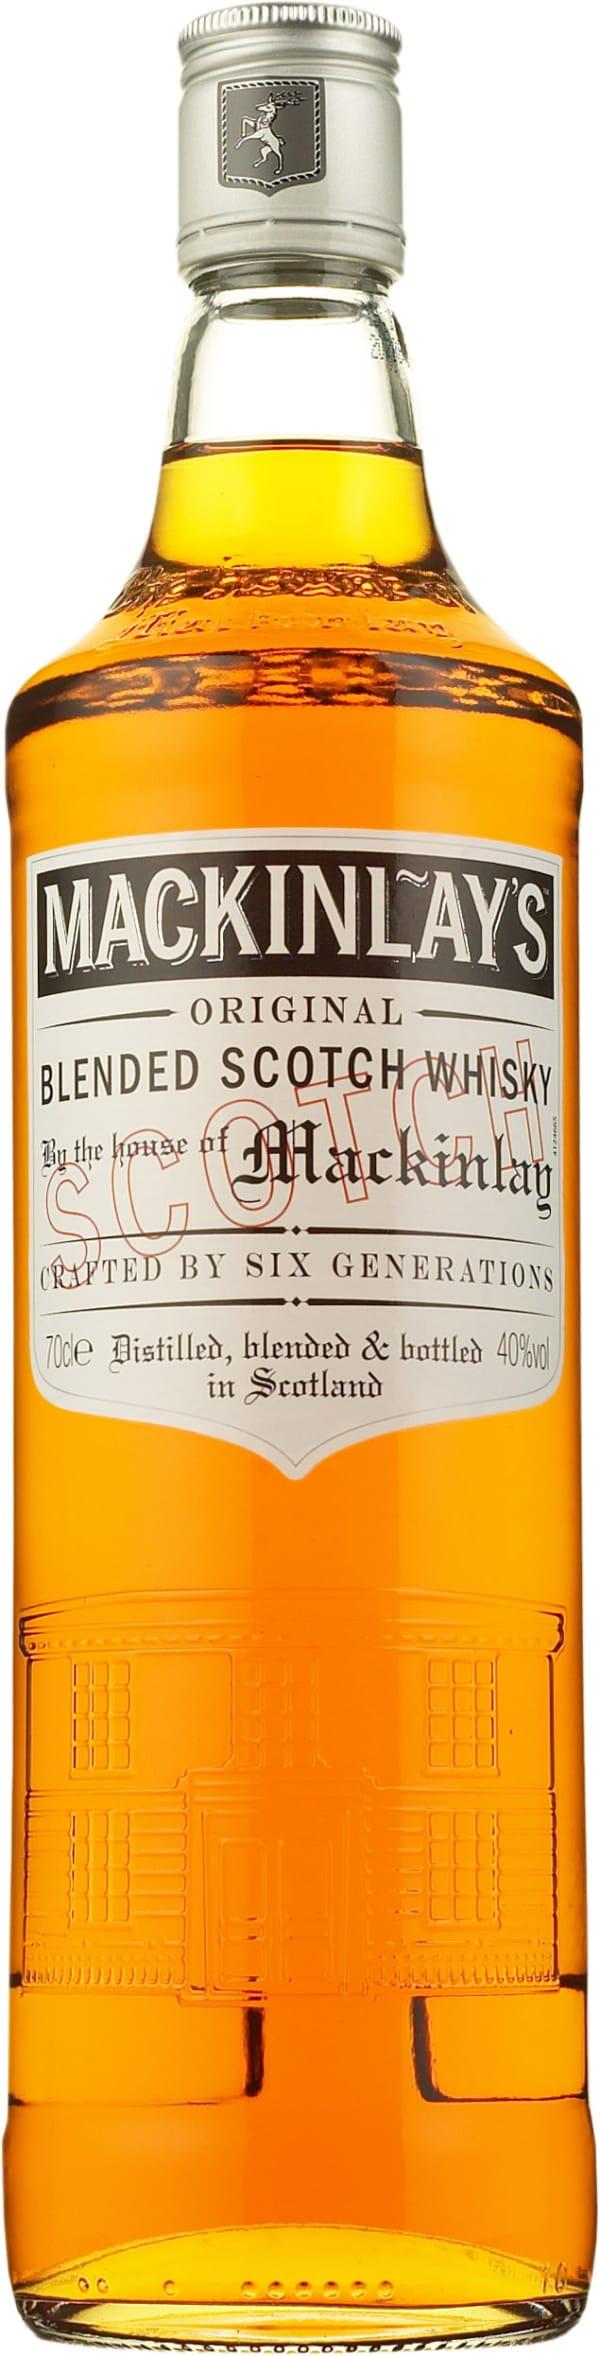 Mackinlay's Original